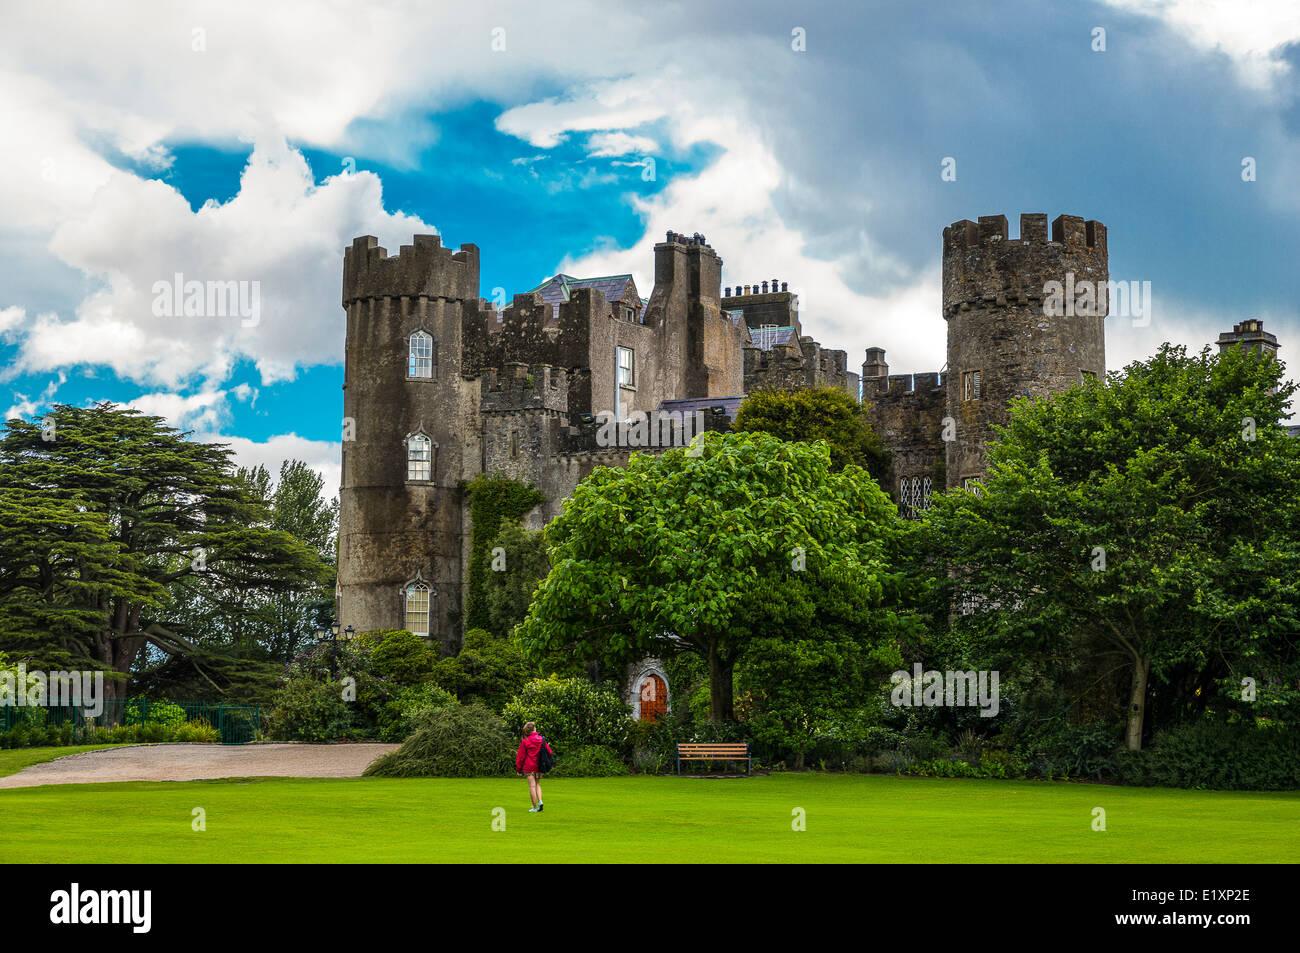 Ireland, Dublin county, the Malahide castle and garden - Stock Image